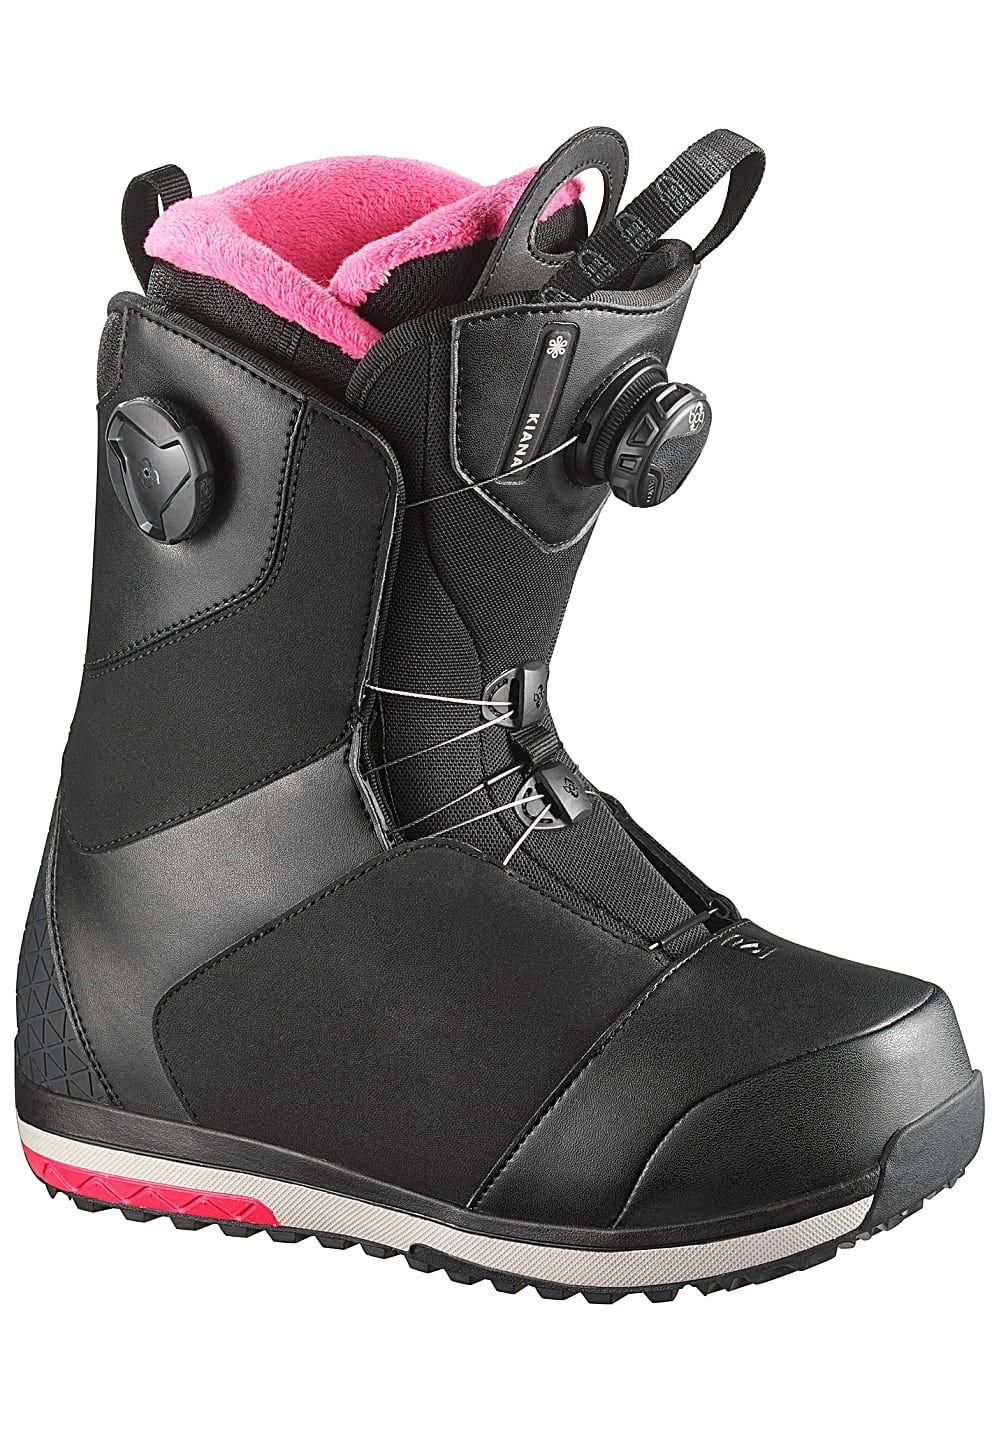 Salomon Kiana Focus Boa Snowboard Boots für Damen